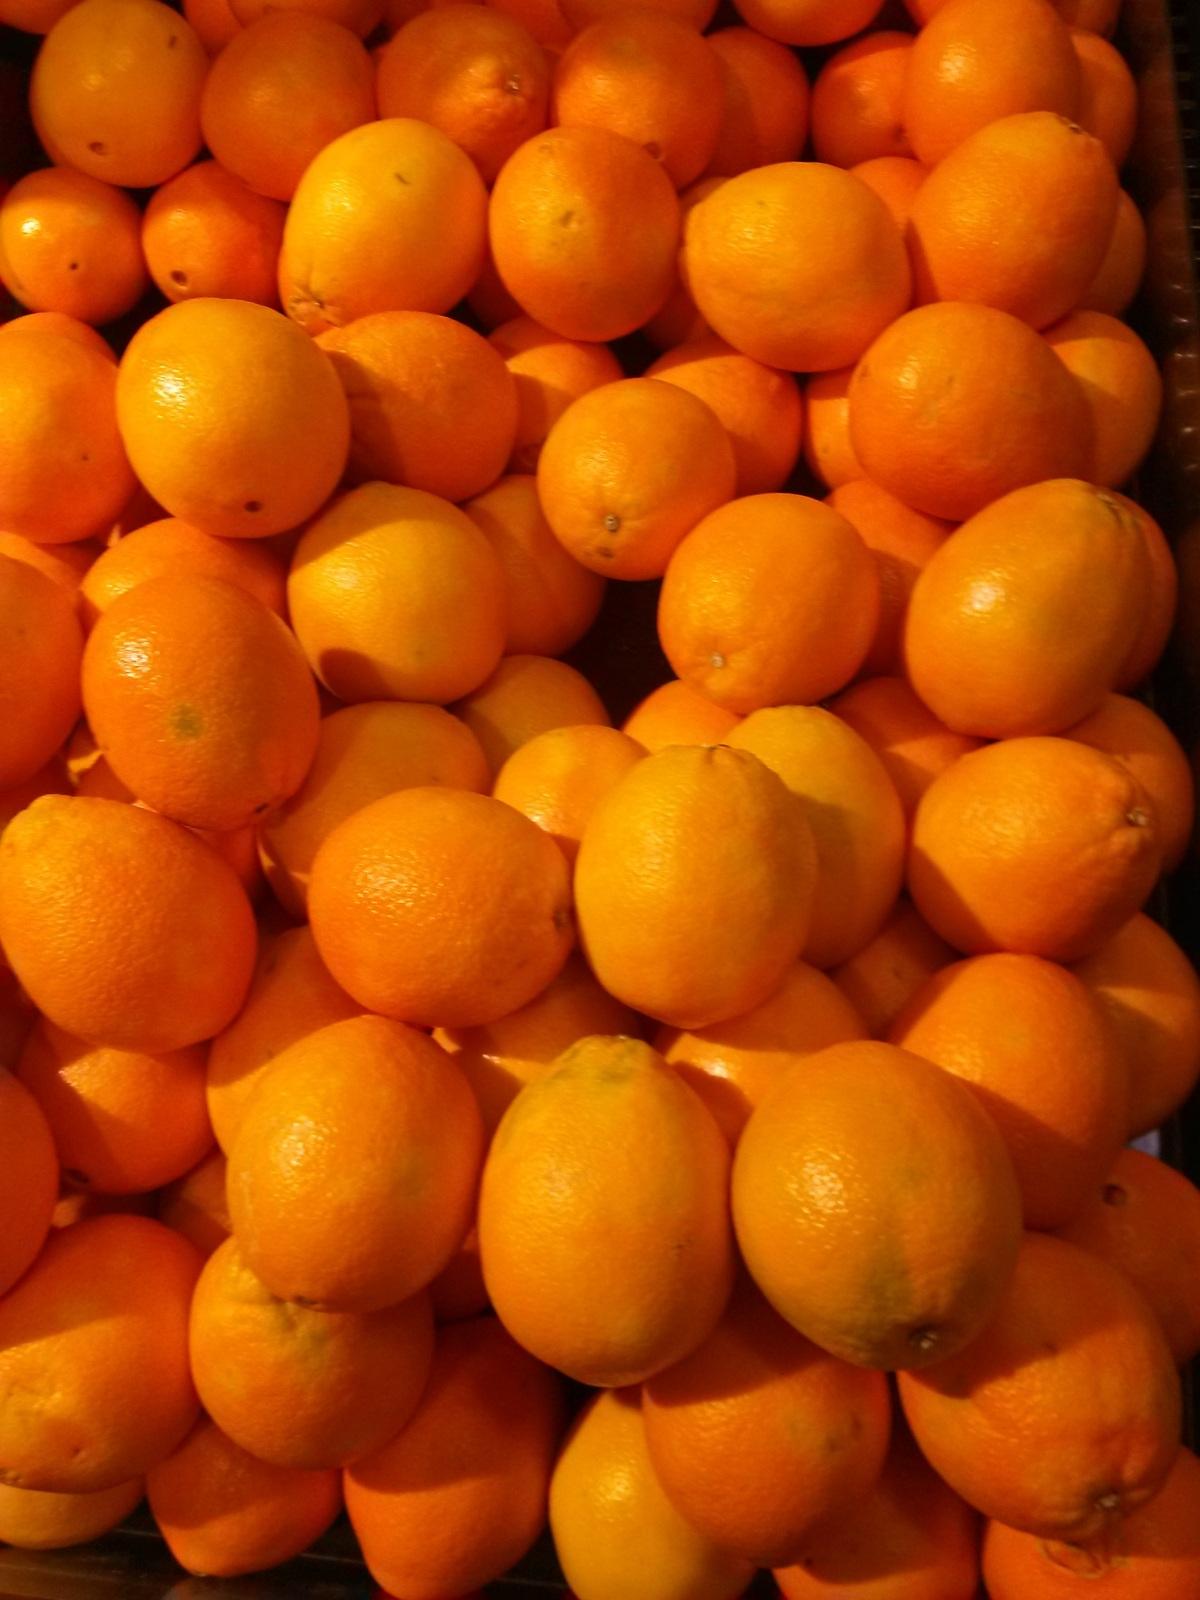 How Far Can 791 Oranges GetYou?